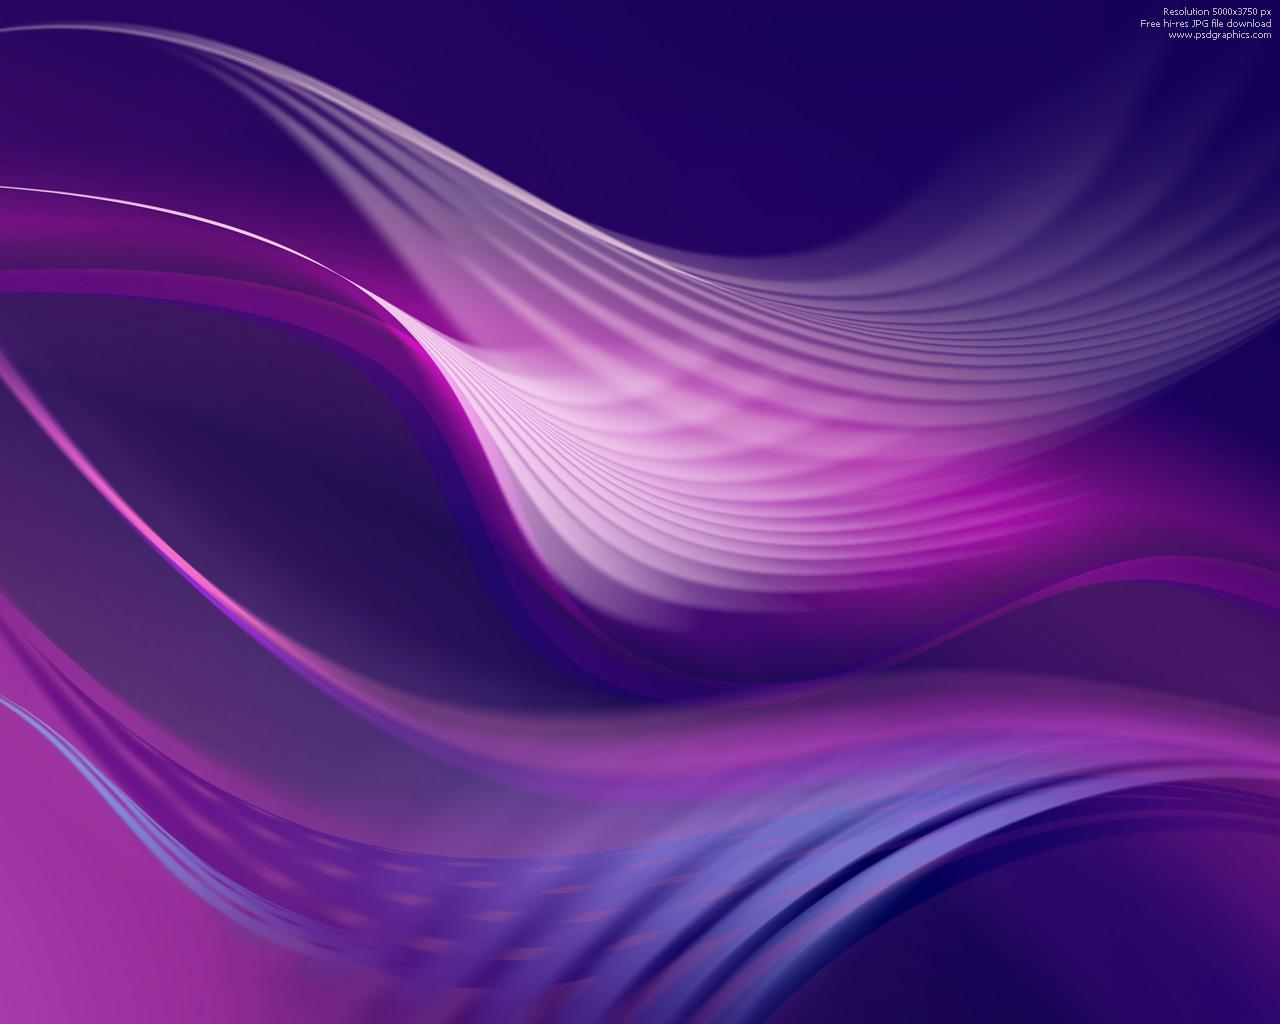 Wallpaper Maza Purple Wallpaper 1280x1024